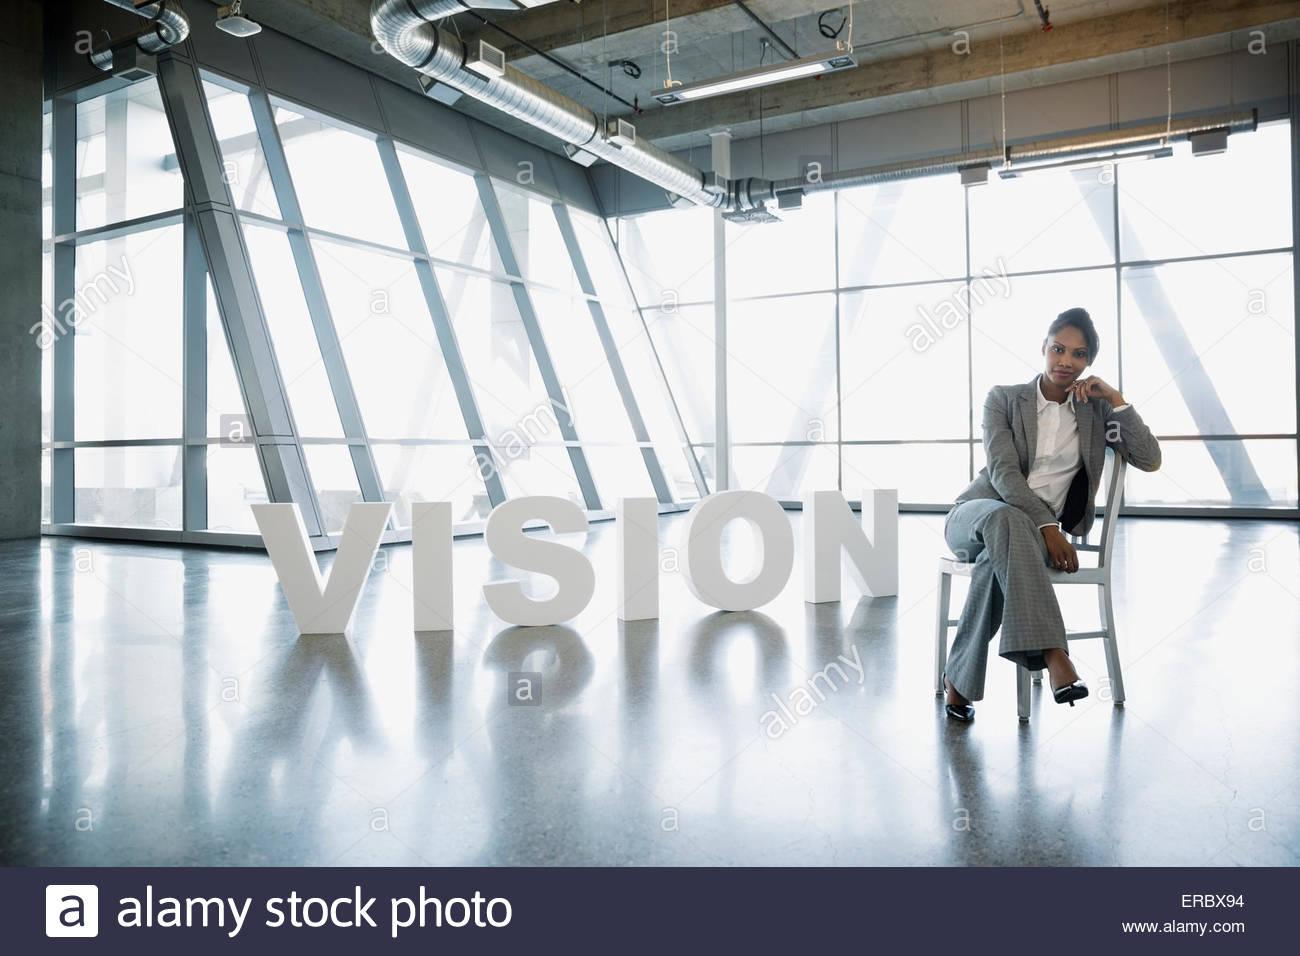 Porträt-Geschäftsfrau saß neben 'Vision' Briefe Stockbild